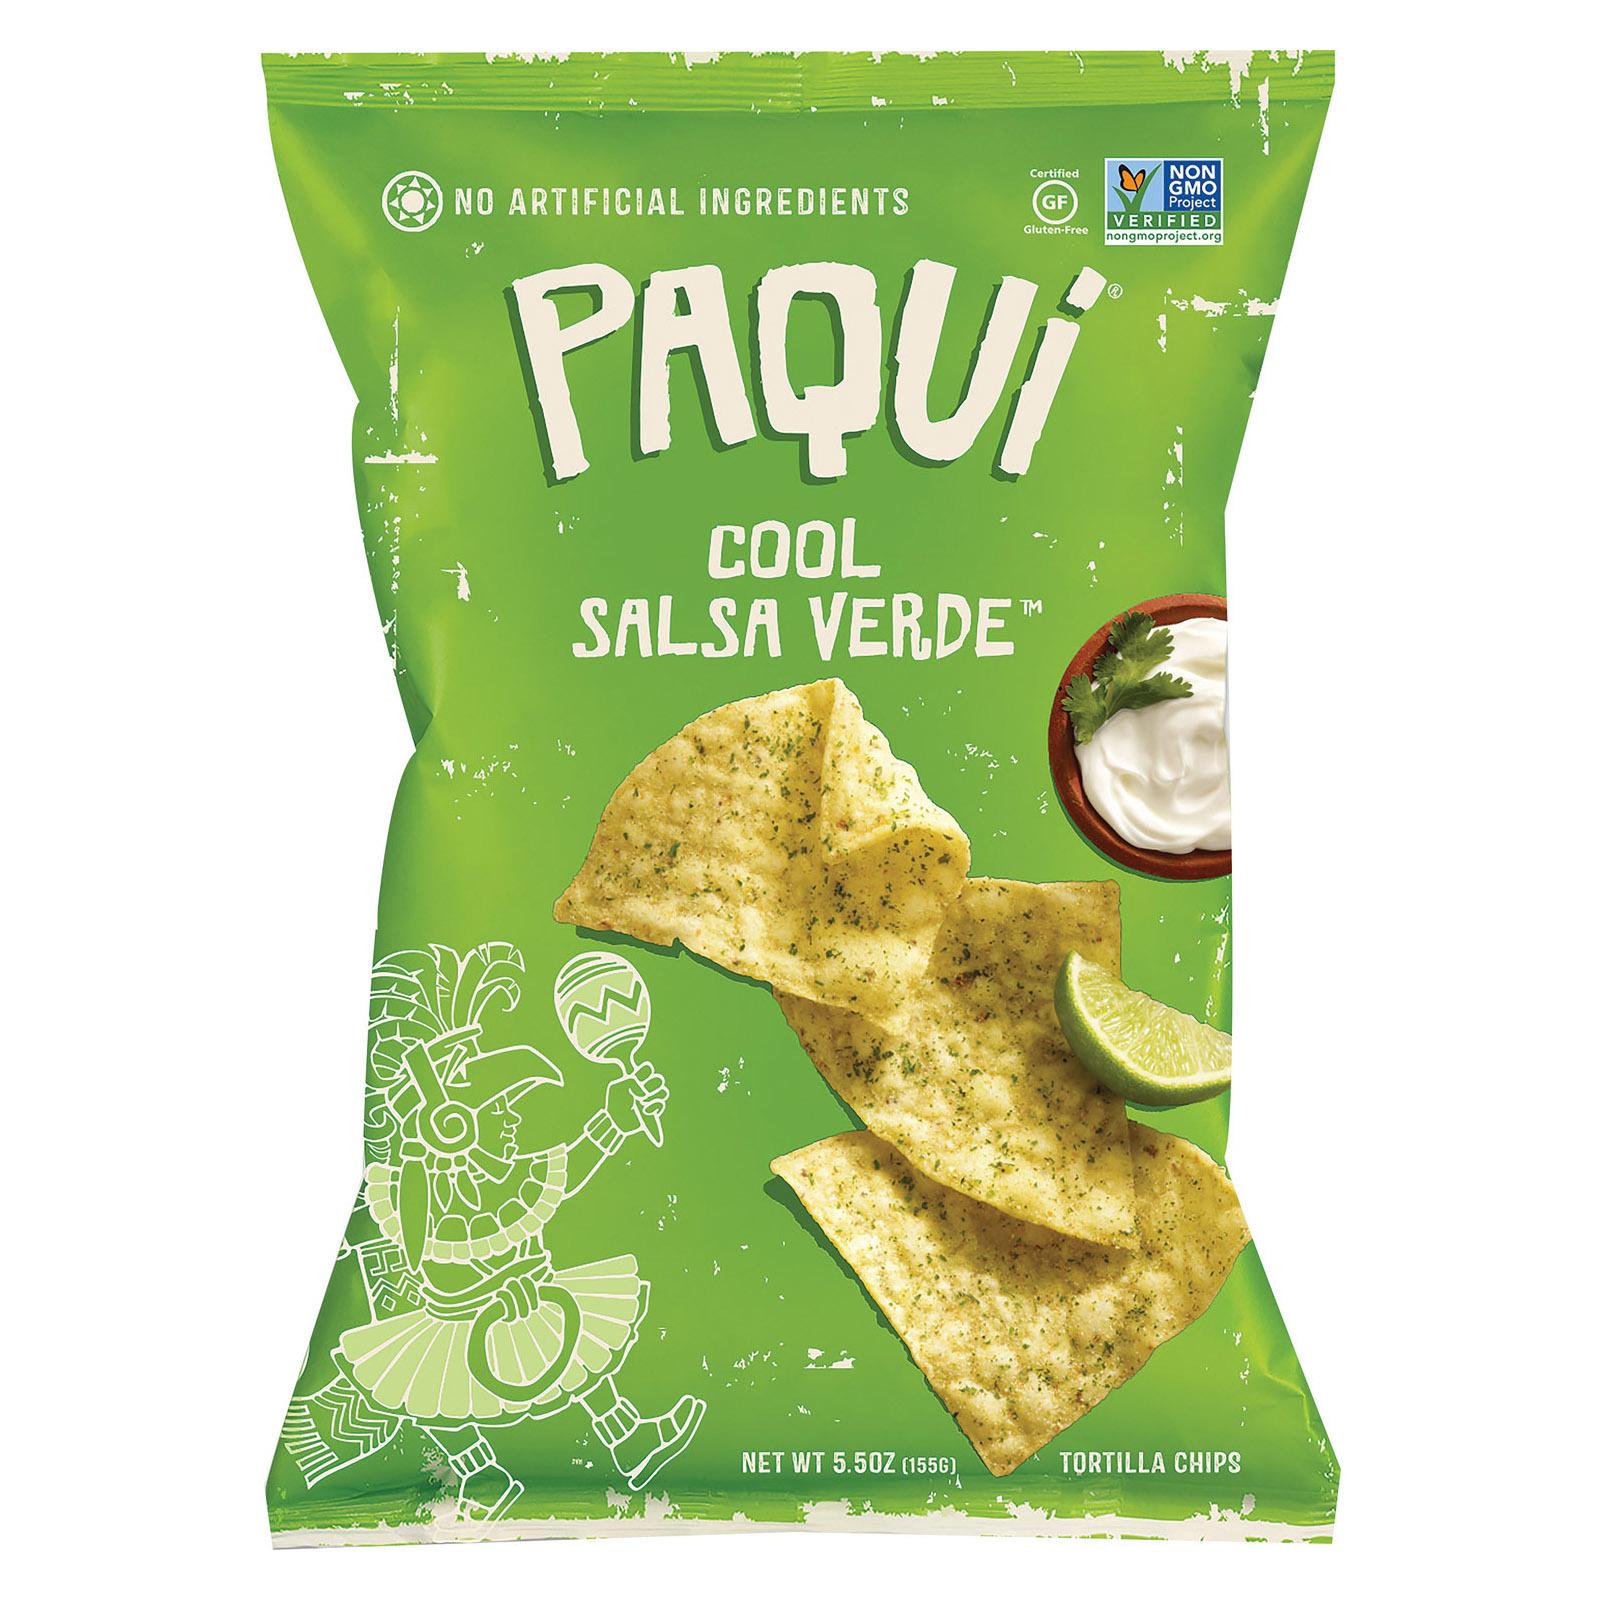 Paqui Tortilla Chip - Very Verde Good - Case of 12 - 5.5 oz.